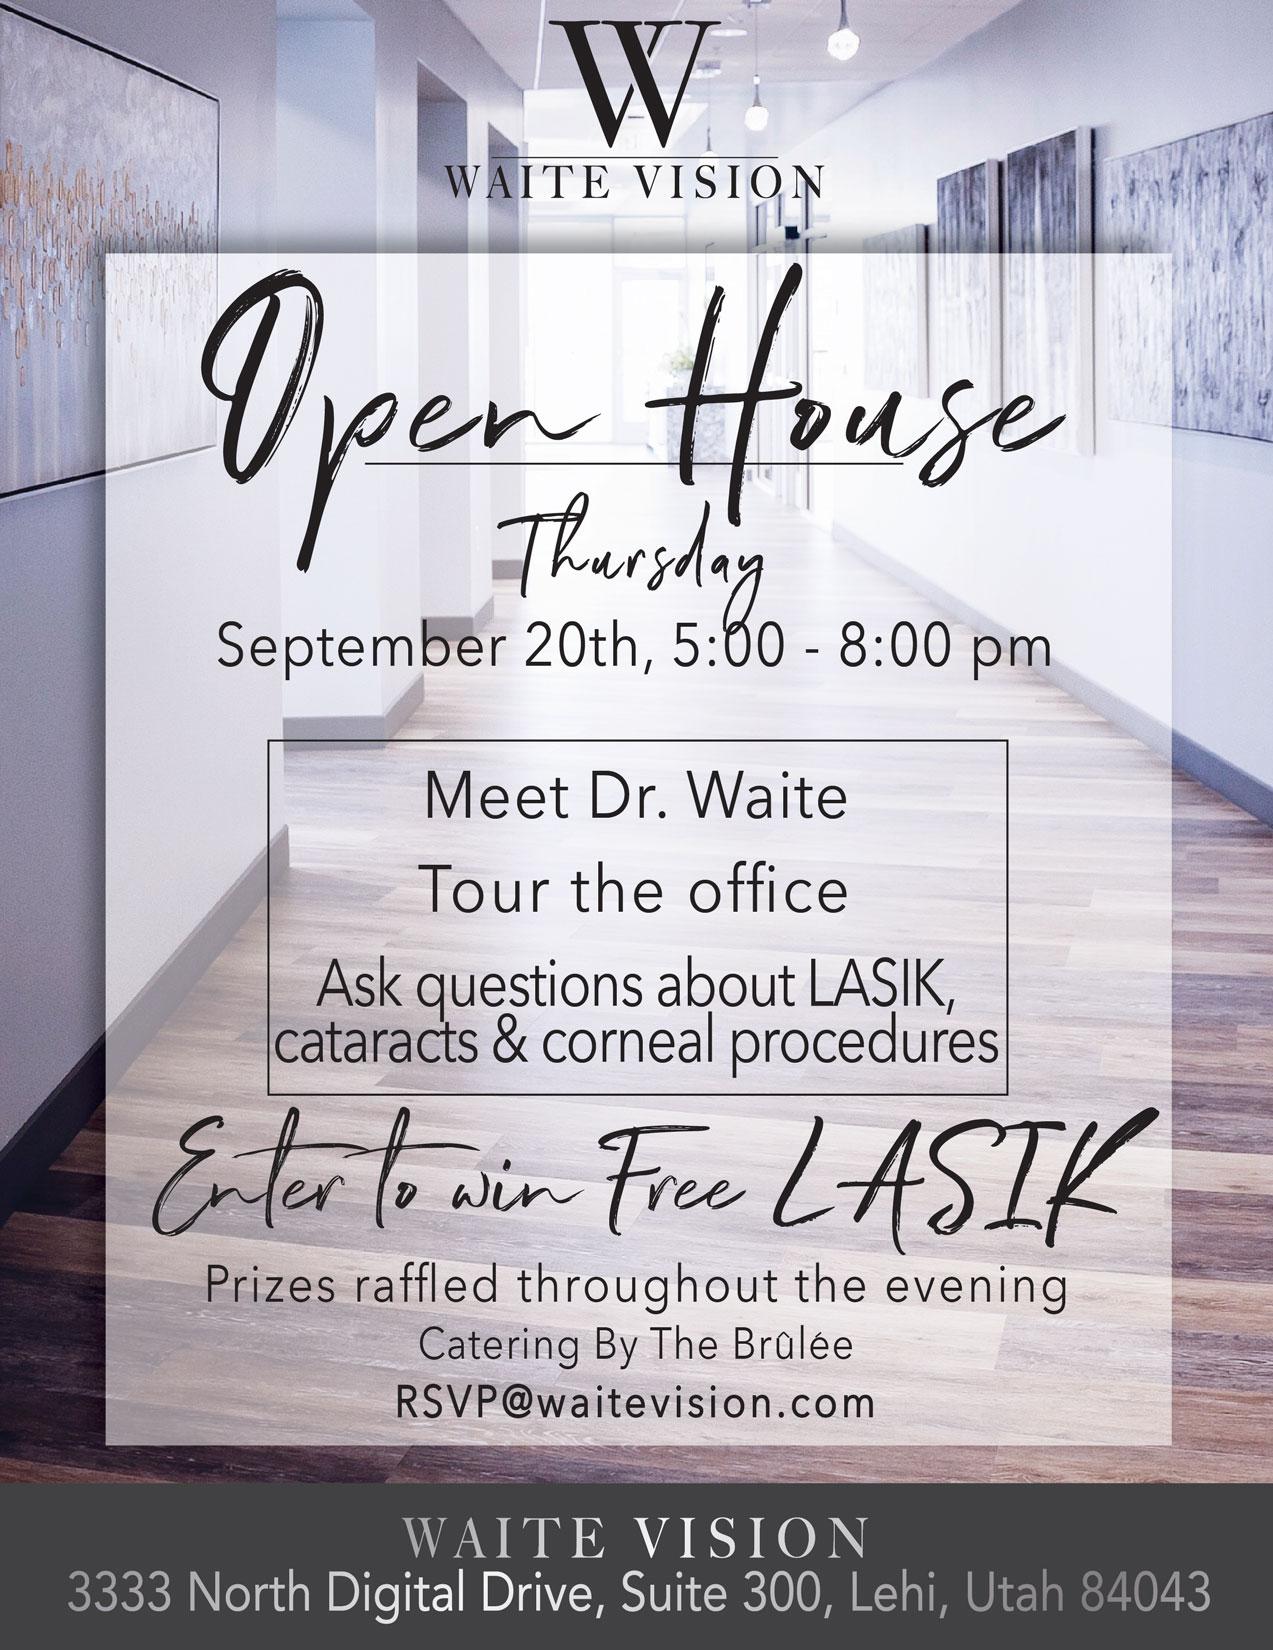 Waite Vision Open House